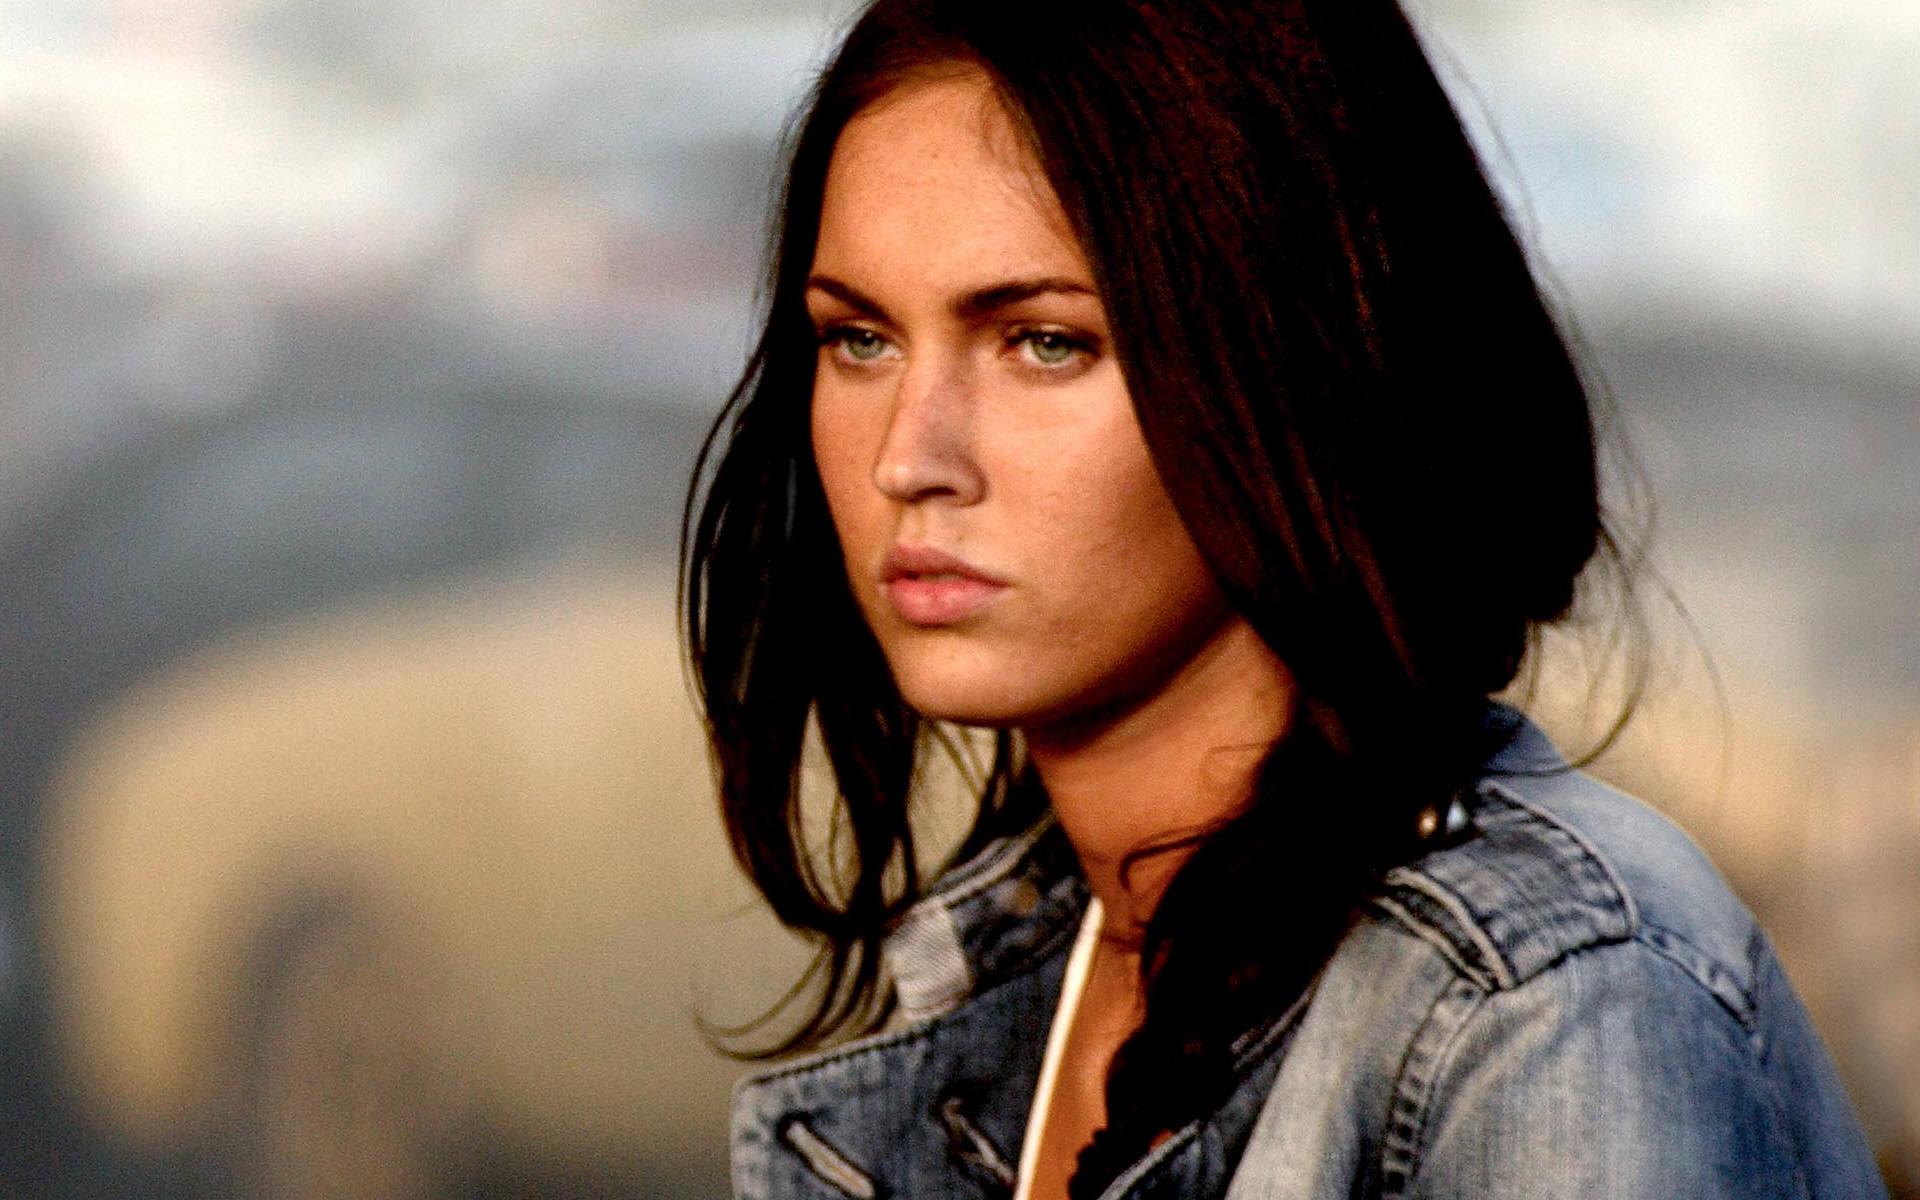 Flórida: Walmart proibiu a imagem ou a presença de Megan Fox